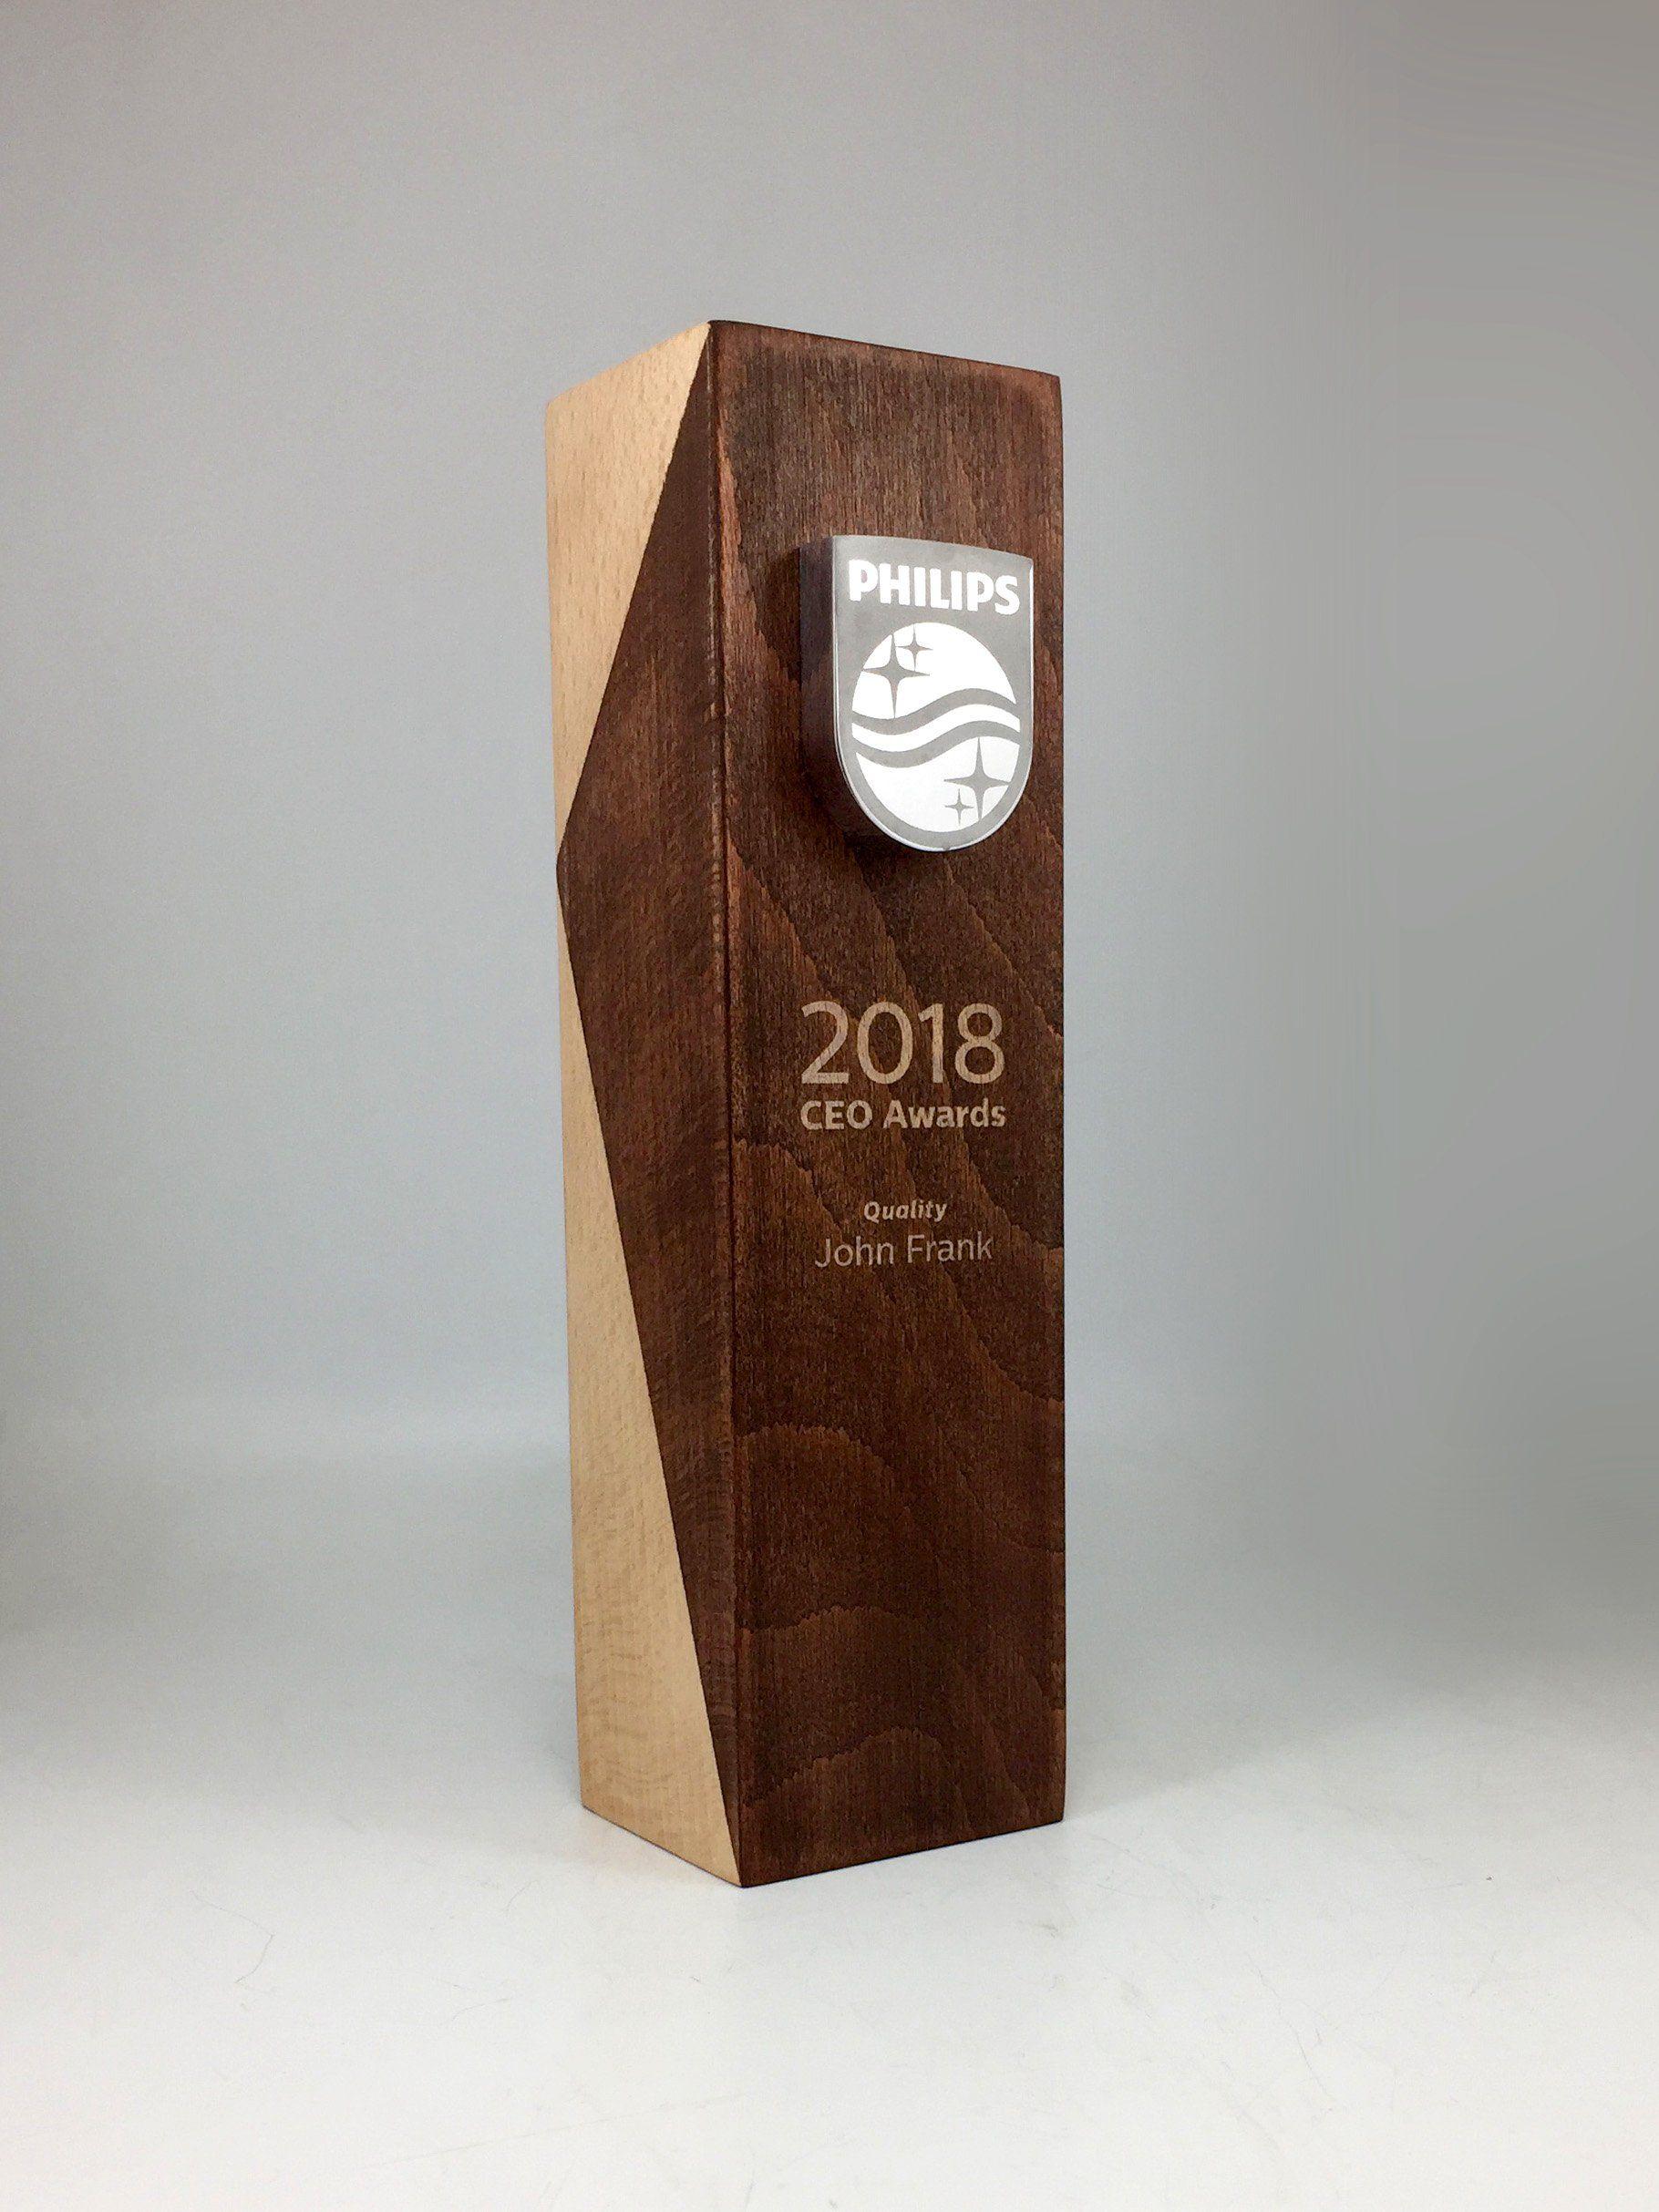 Philips Angled Wood And Shield Award Chọn Mẫu Wooden